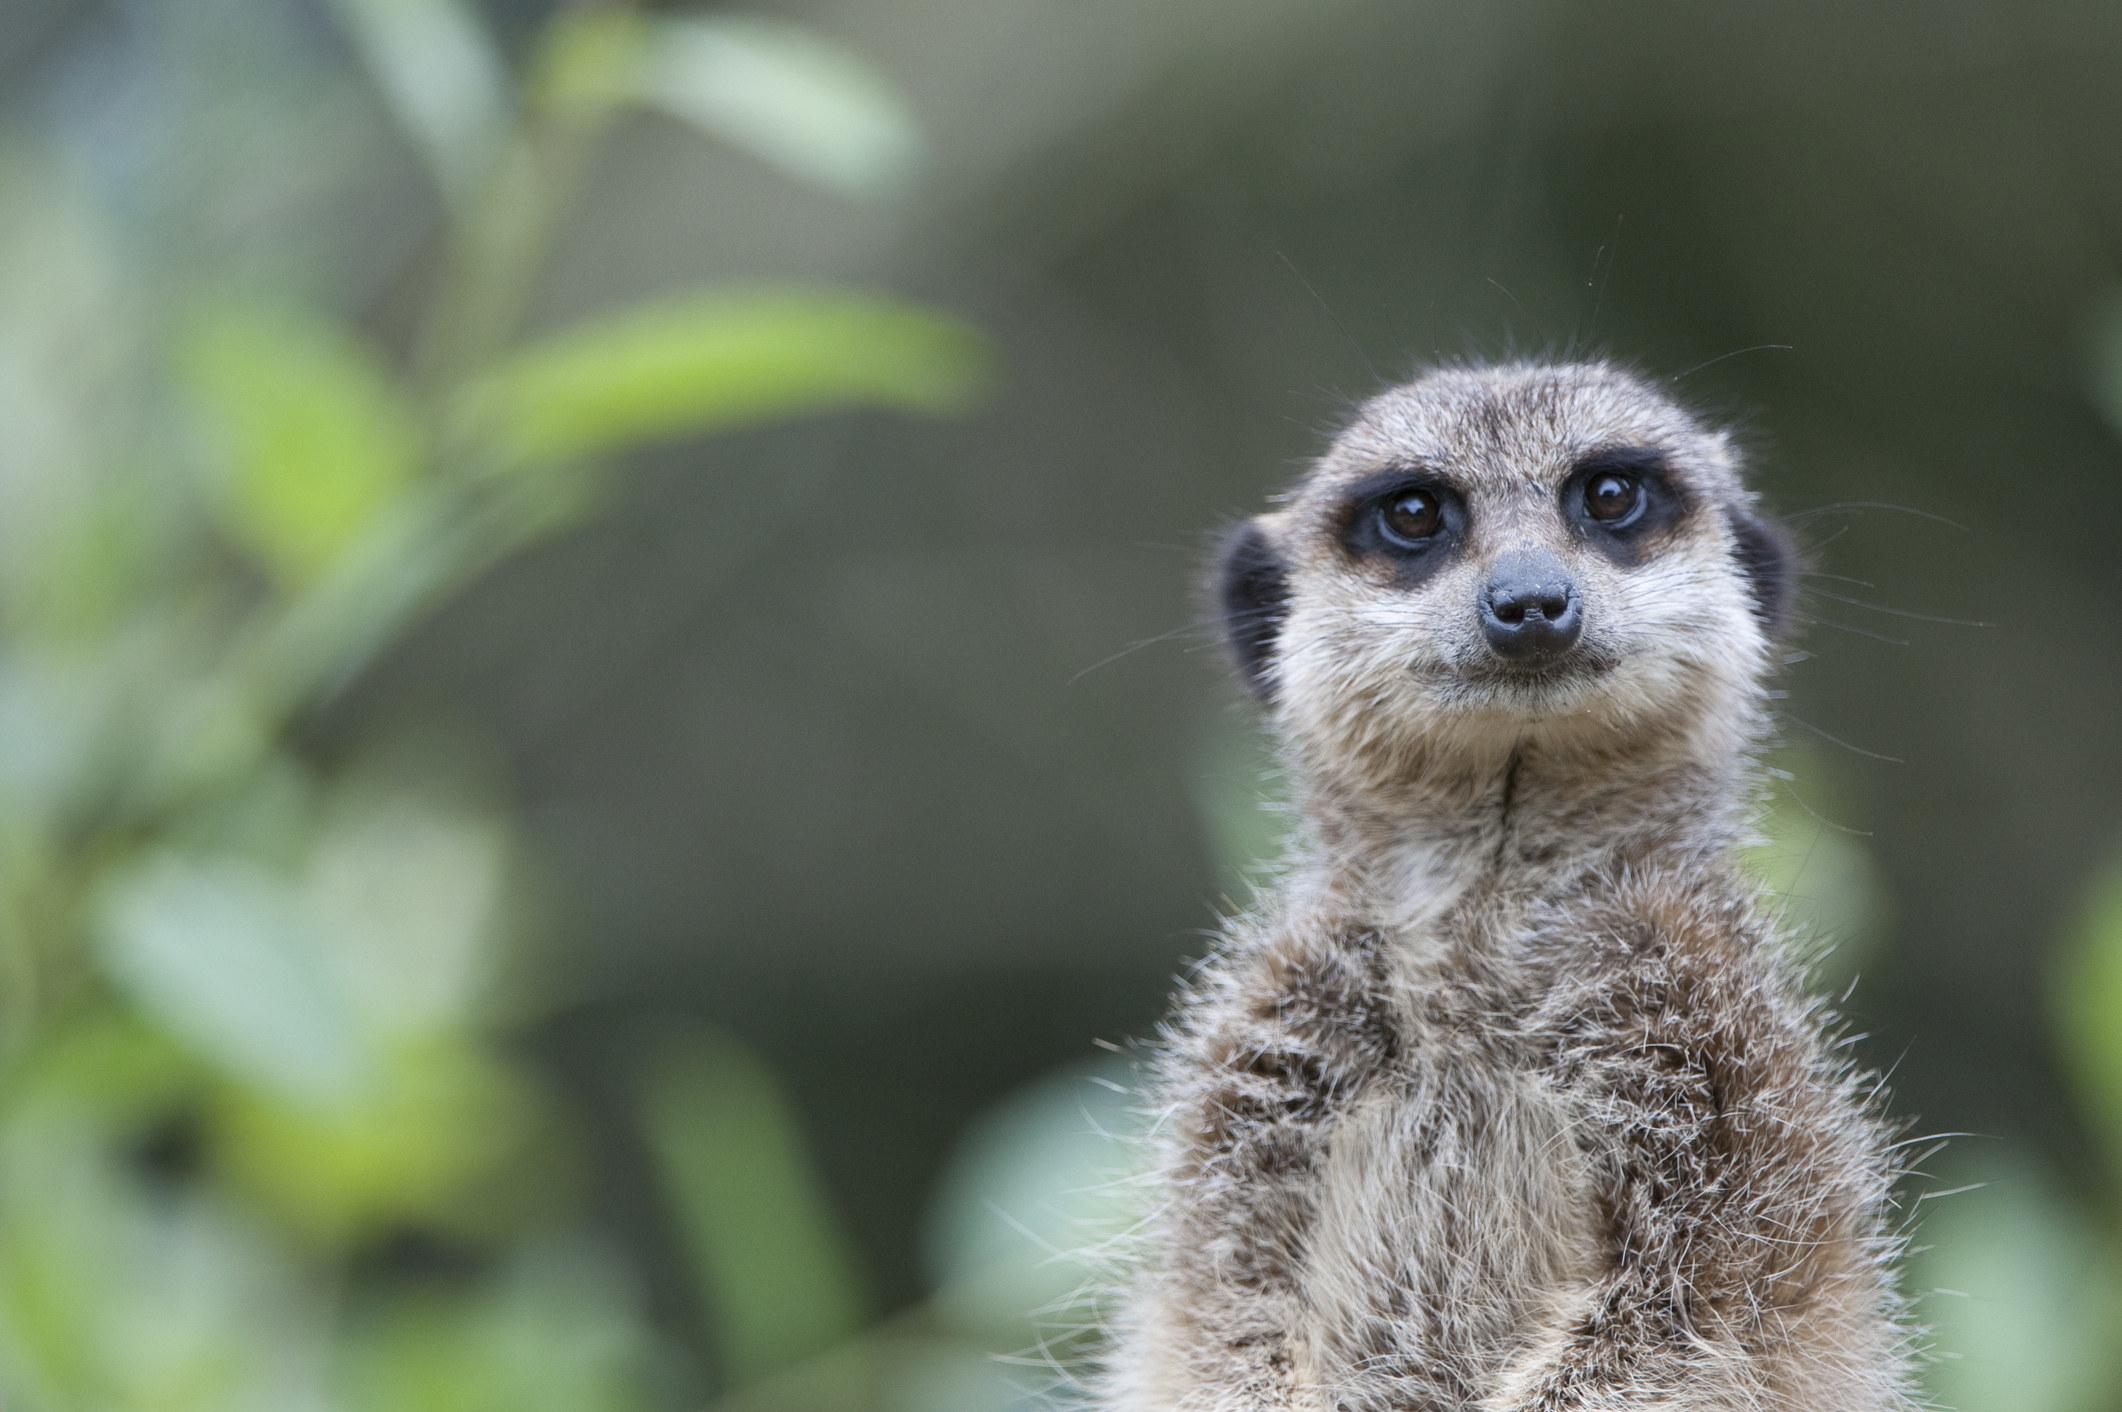 meerkat staring ahead of the camera